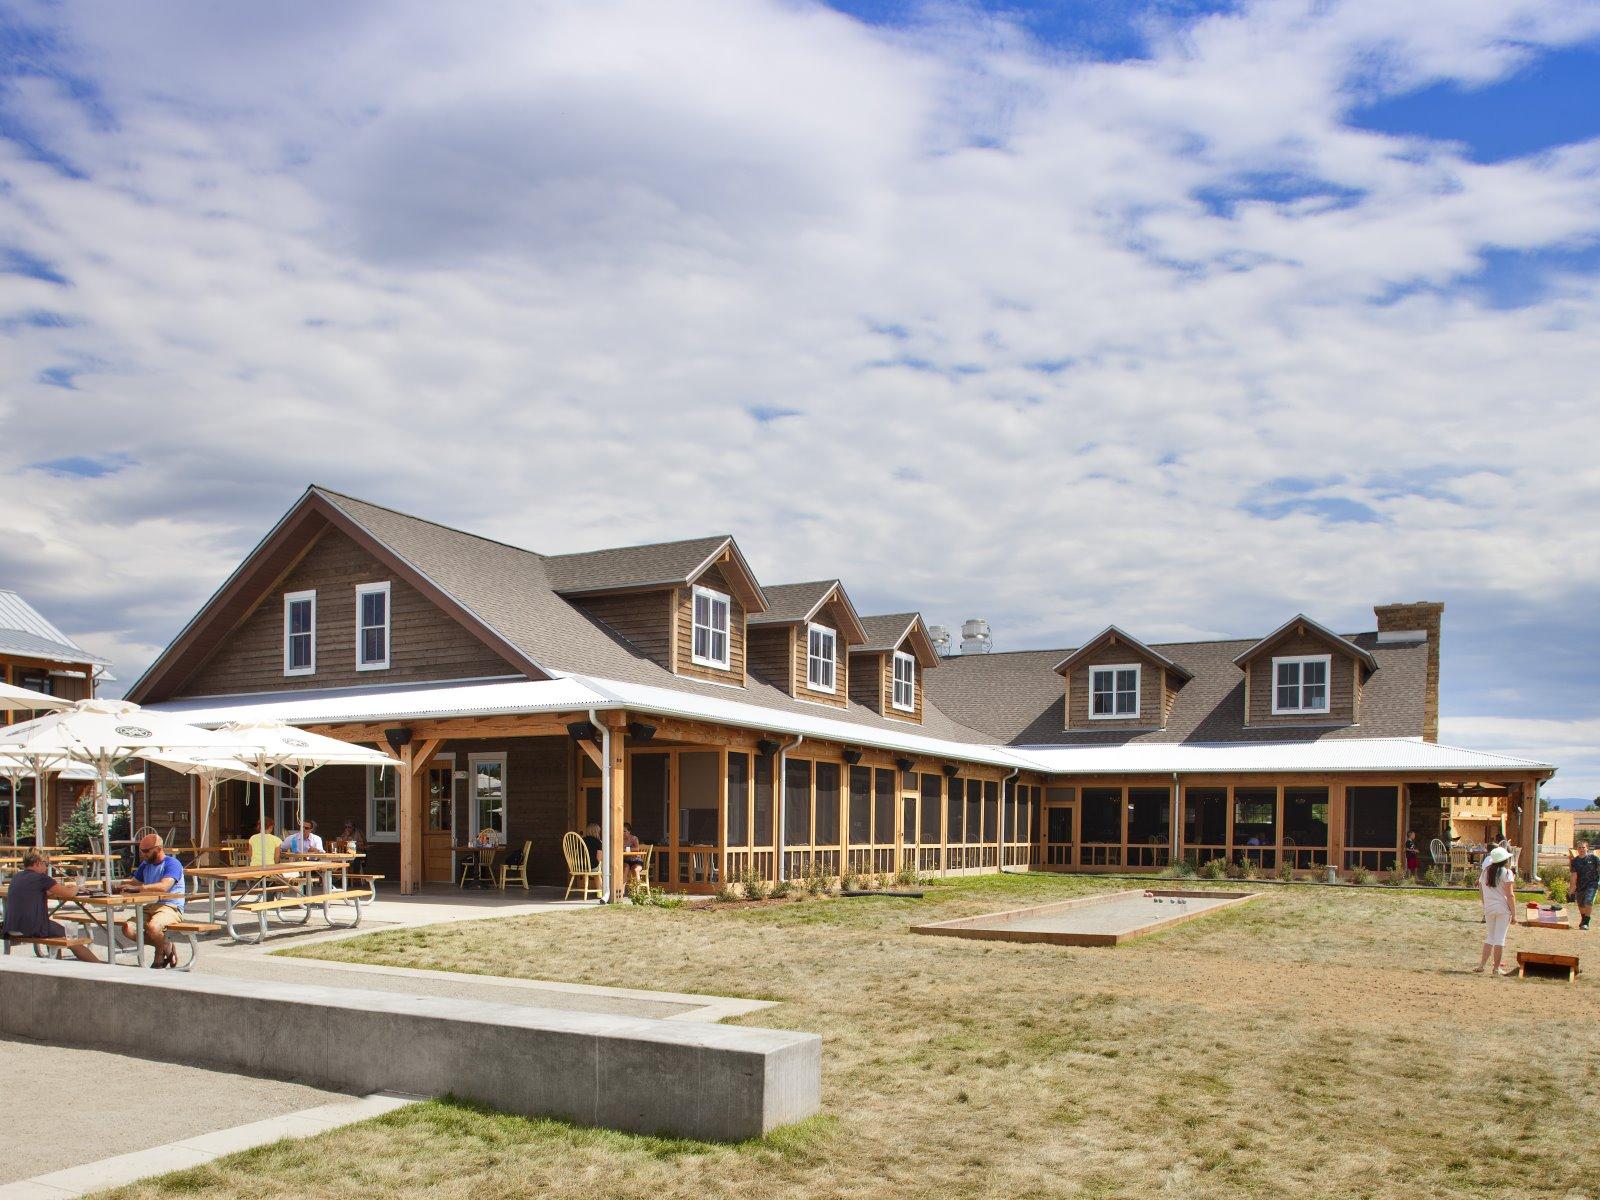 Breckenridge Brewery Farm House Restaurant (1)web.jpg